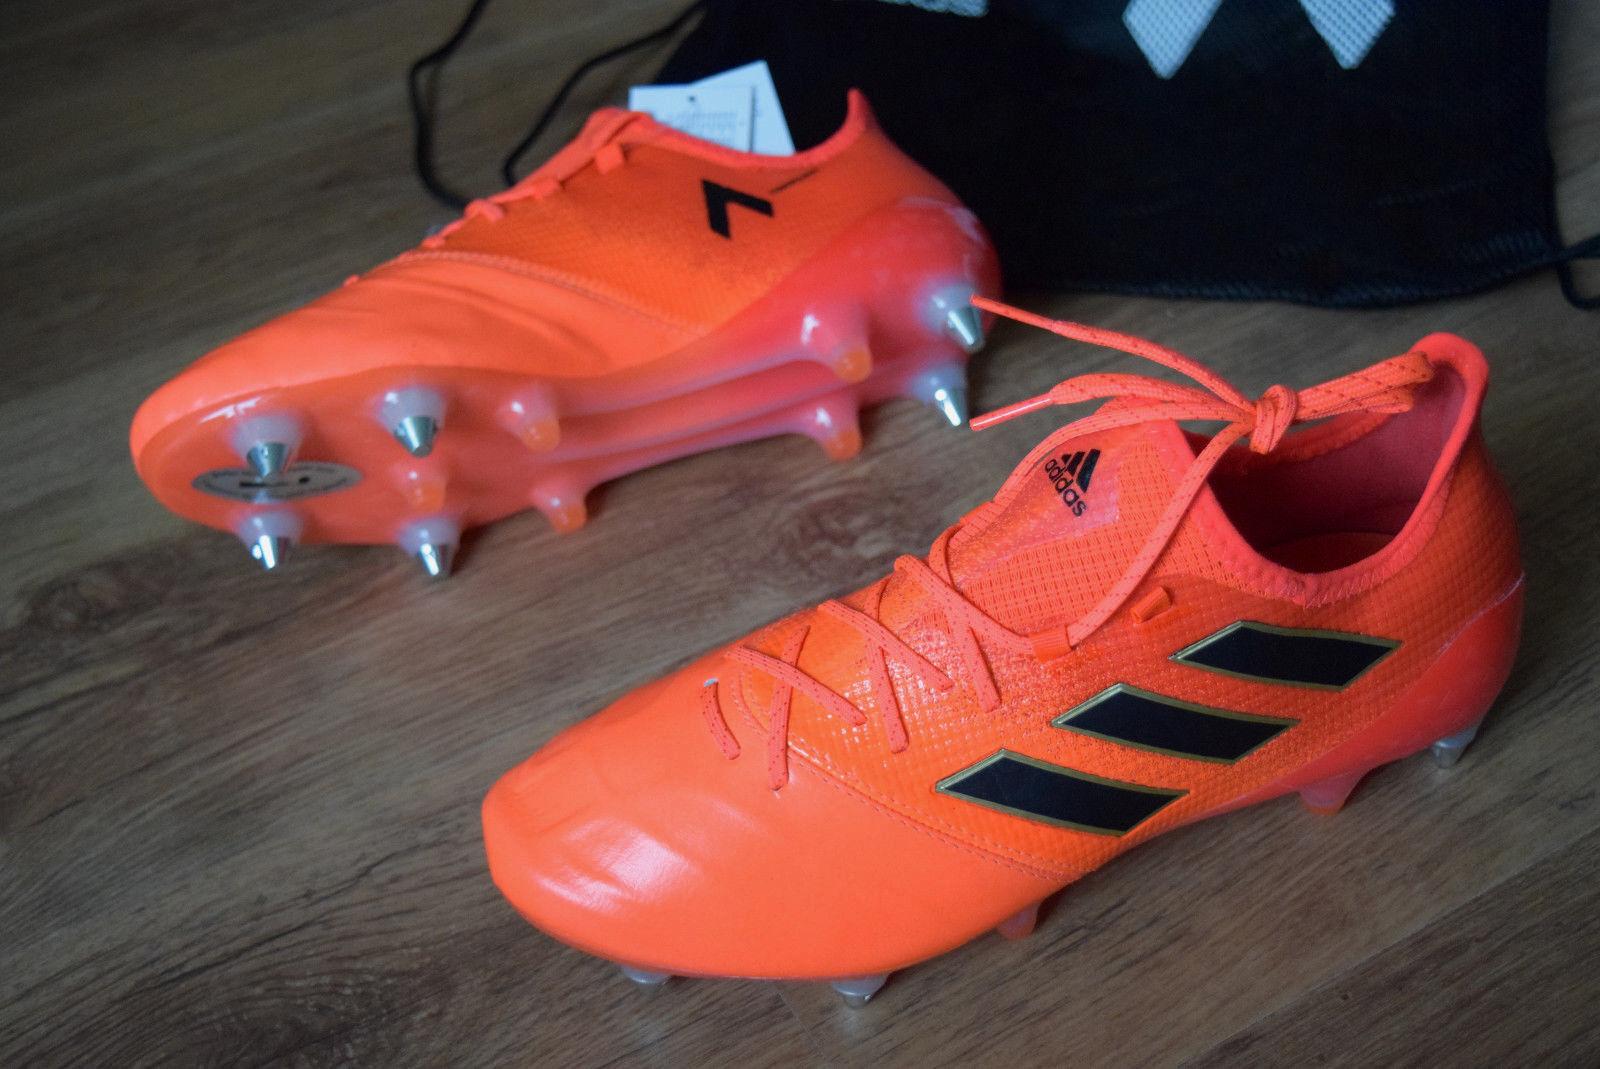 Adidas As 17.1 Sg Piel 40,5 41 42 Soft Ground BY3061 Zapatos de Fútbol Projoator